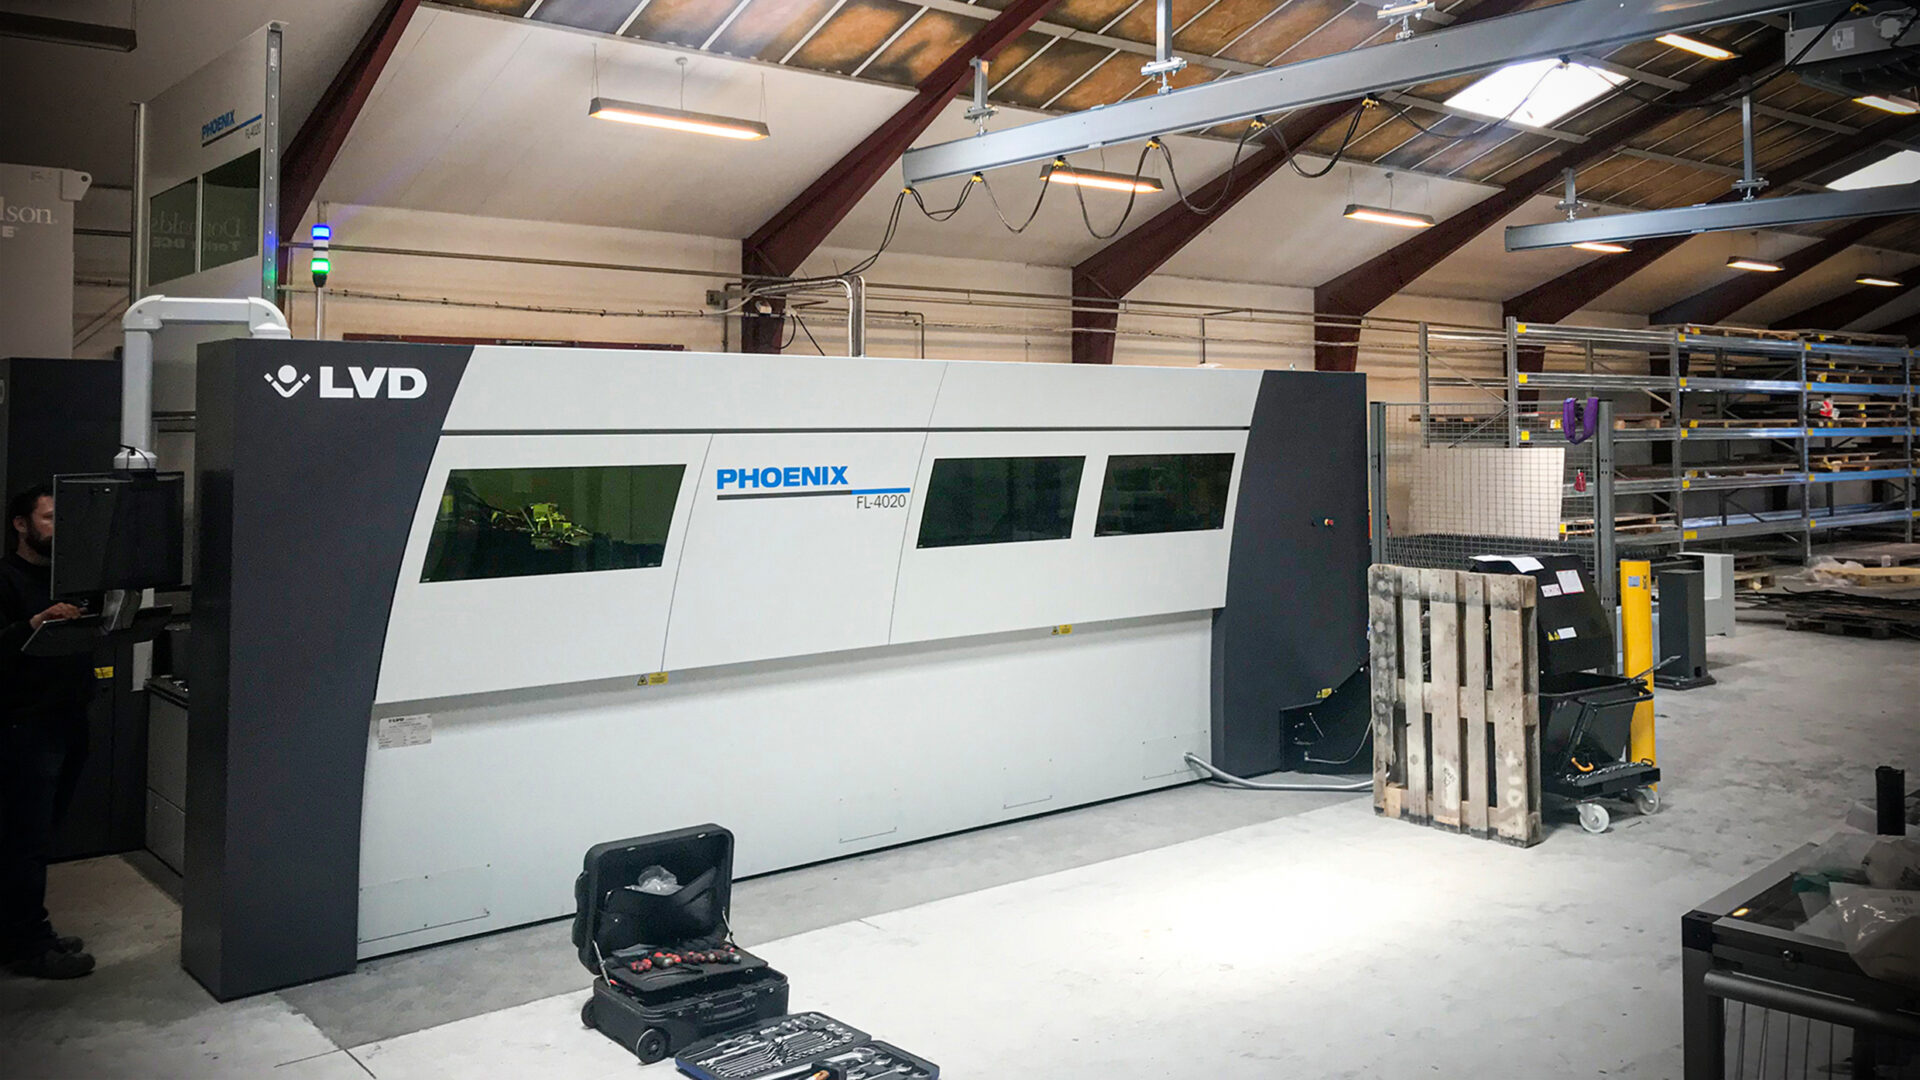 PHOENIX 10 kW LVD fiberlaser skærer